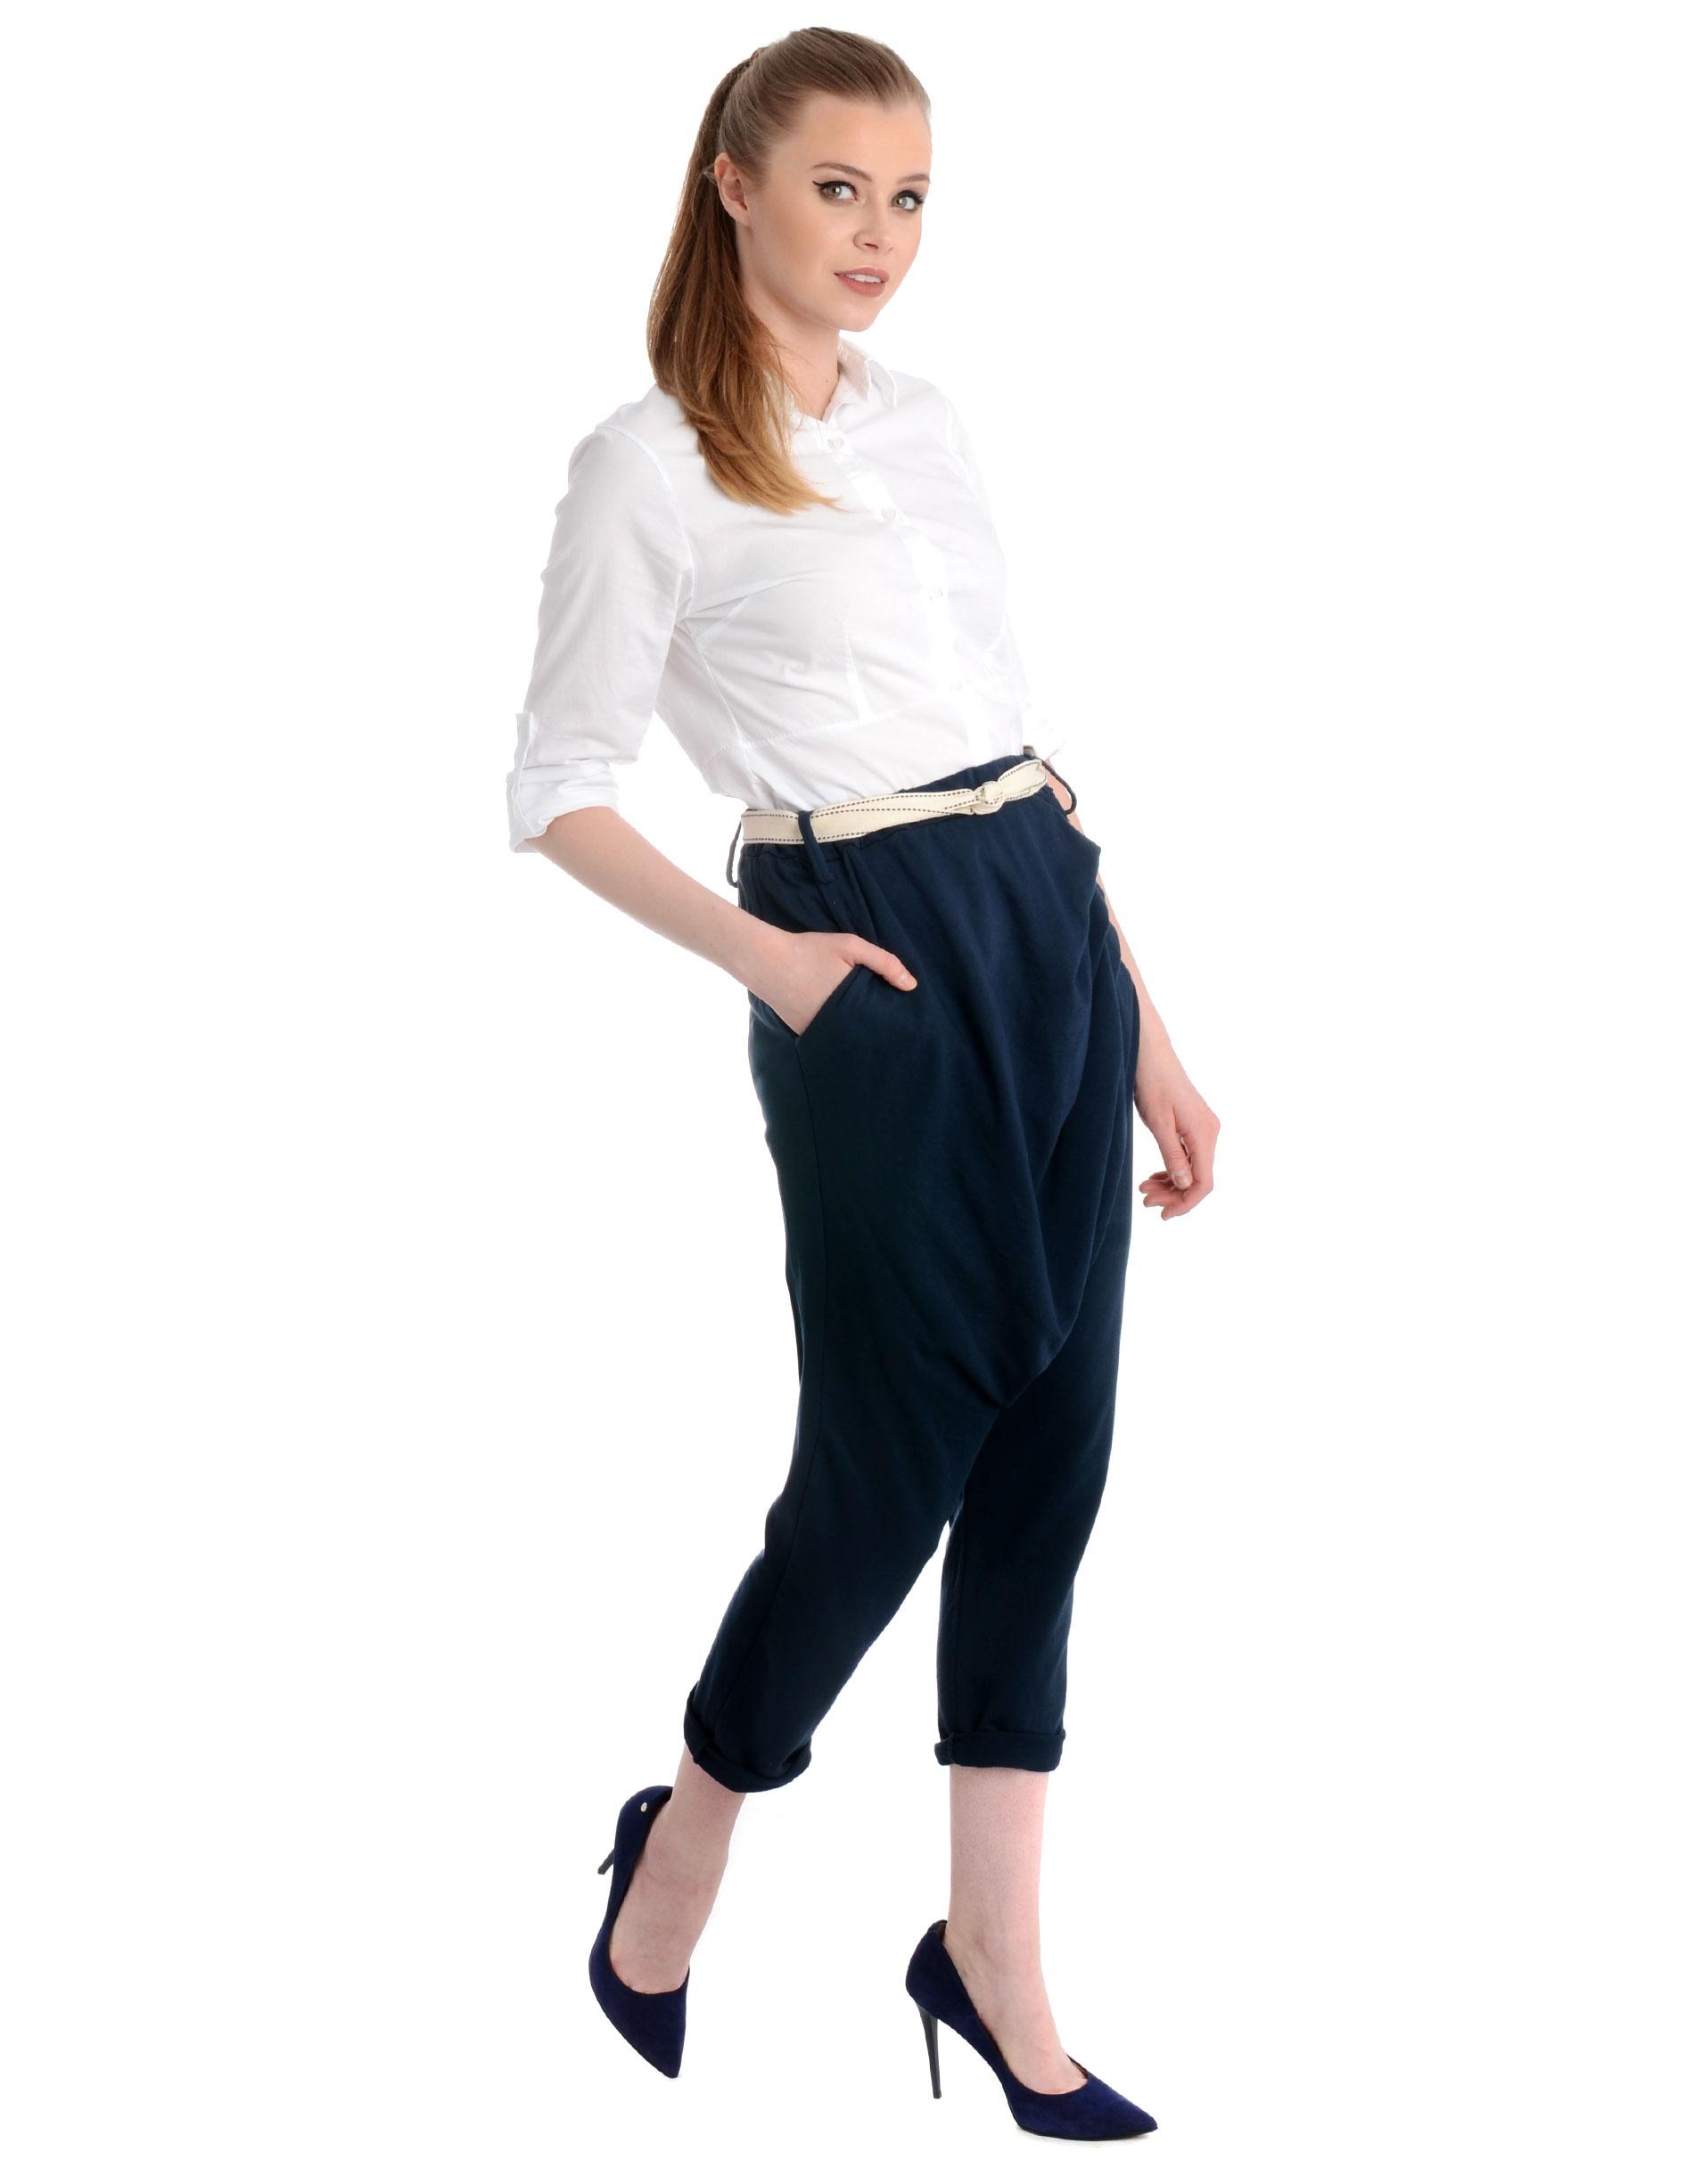 Spodnie - 62-5368-1 BLS - Unisono